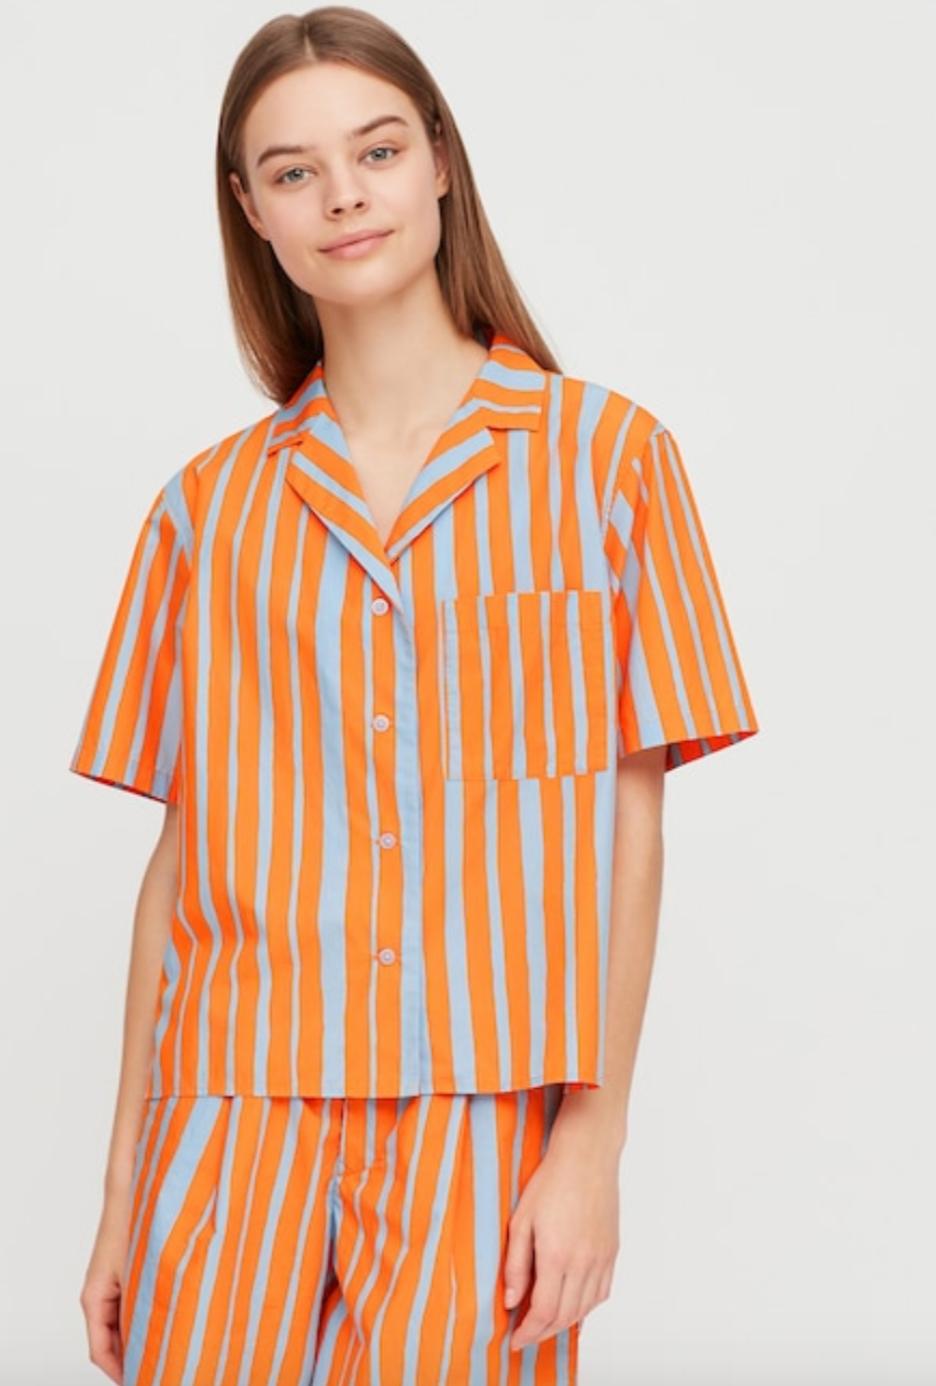 Uniqlo x Marimekko Short-Sleeve Shirt